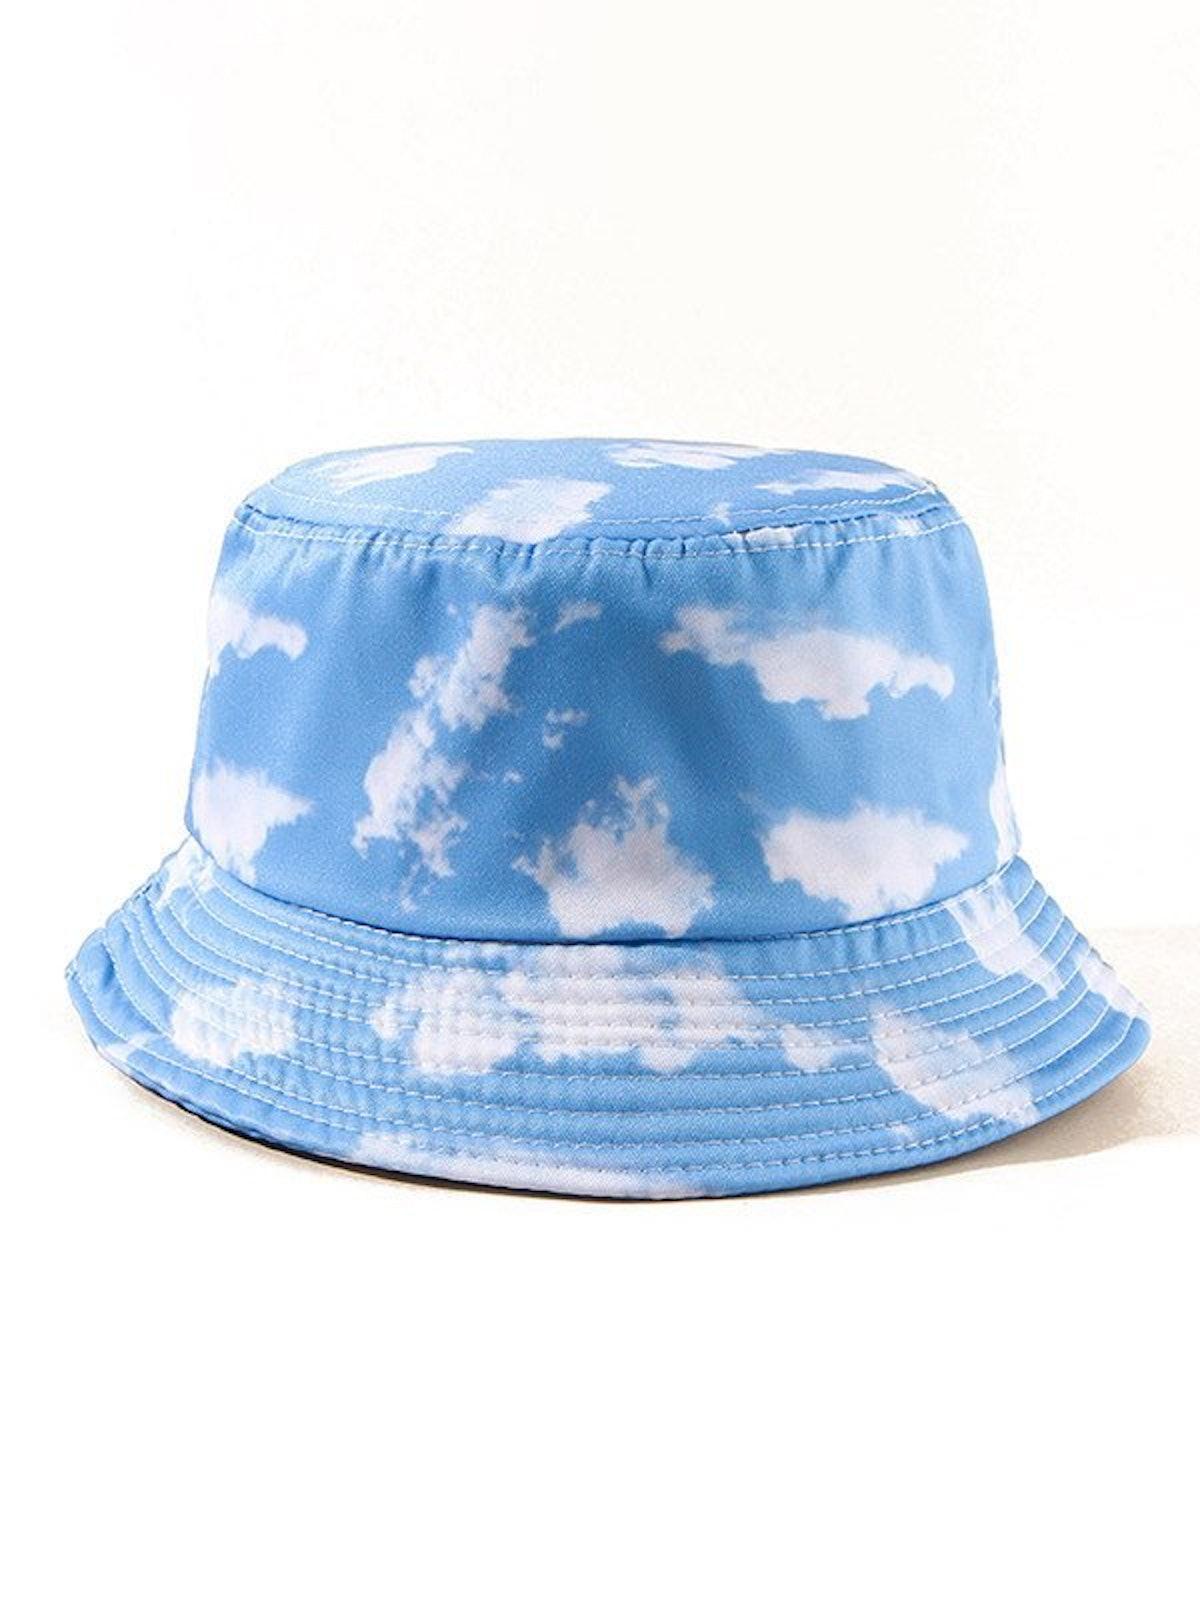 Emmoil Cloud Print Bucket Hat